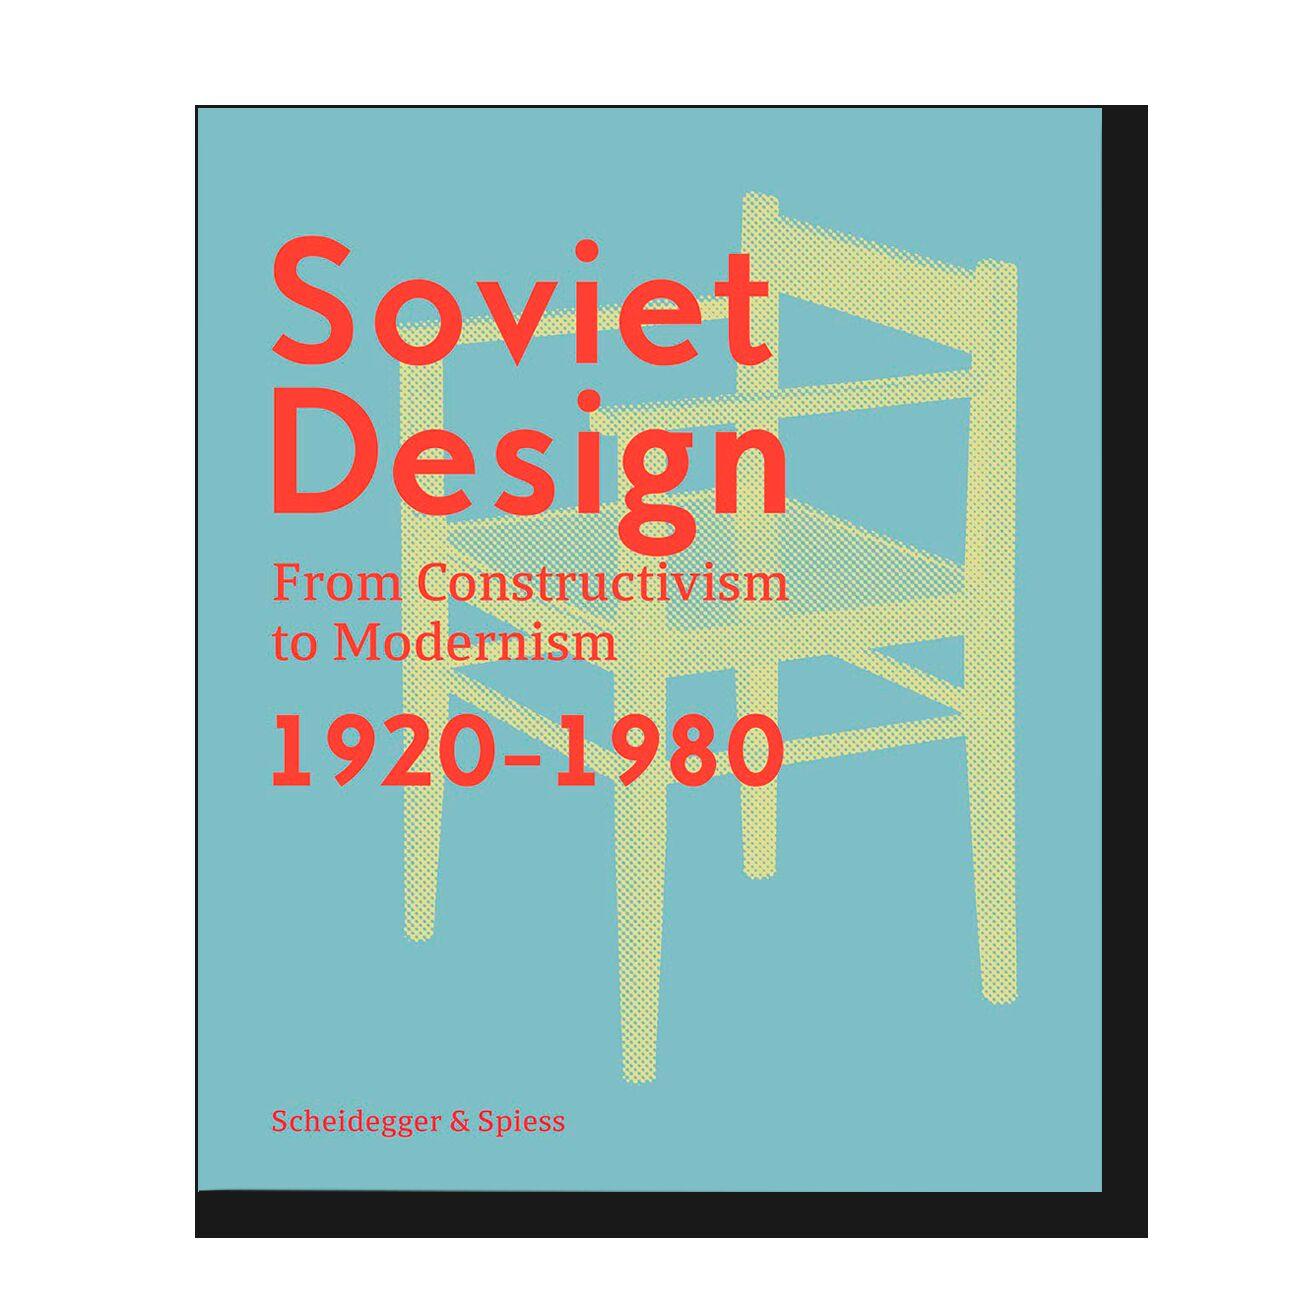 Soviet Design. From Constructivism to Modernism. 1920-1980